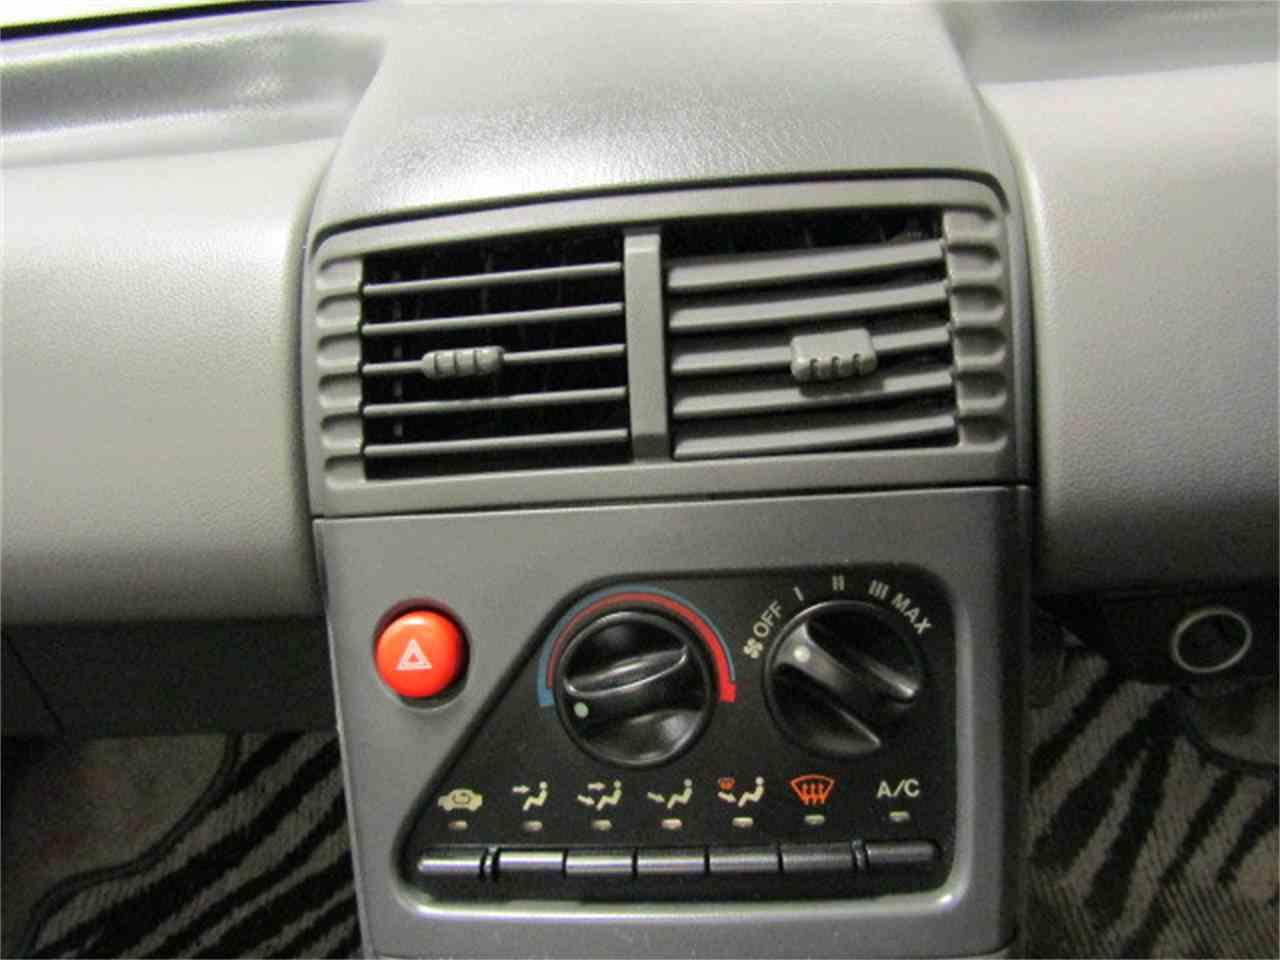 Large Picture of '91 Honda Beat located in Christiansburg Virginia - $6,999.00 - JL83